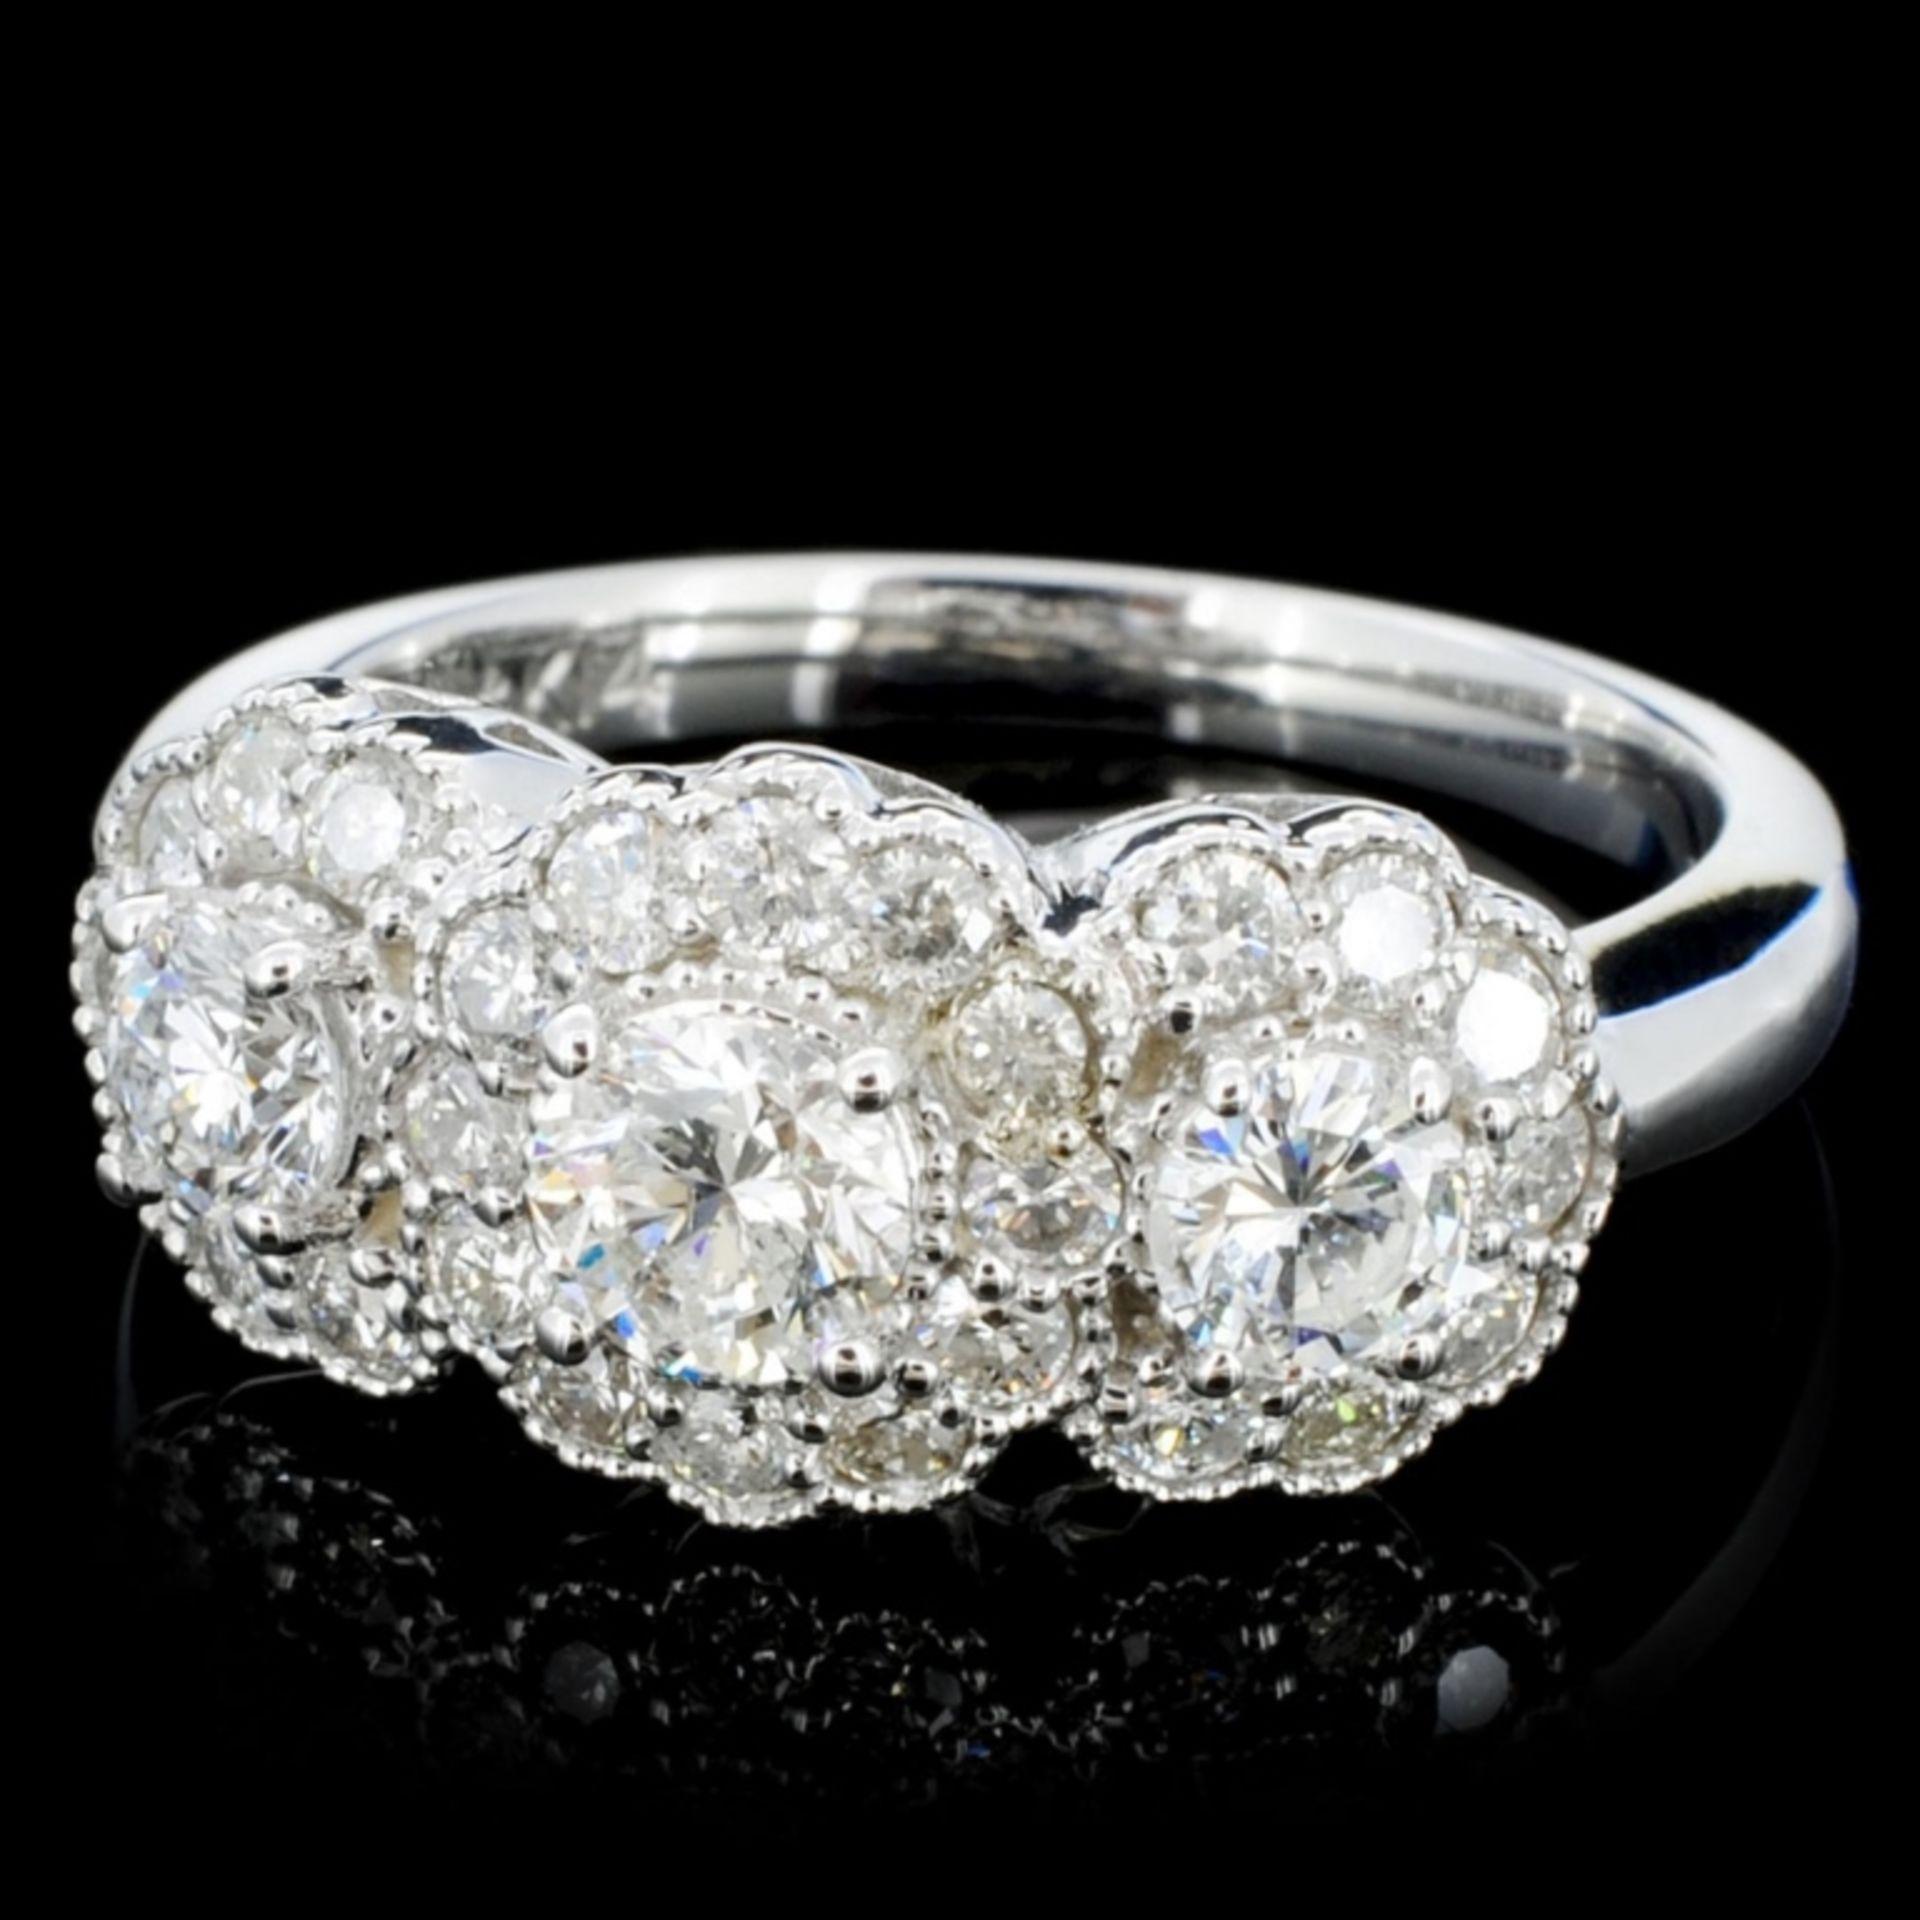 14K Gold 1.20ctw Diamond Ring - Image 2 of 4